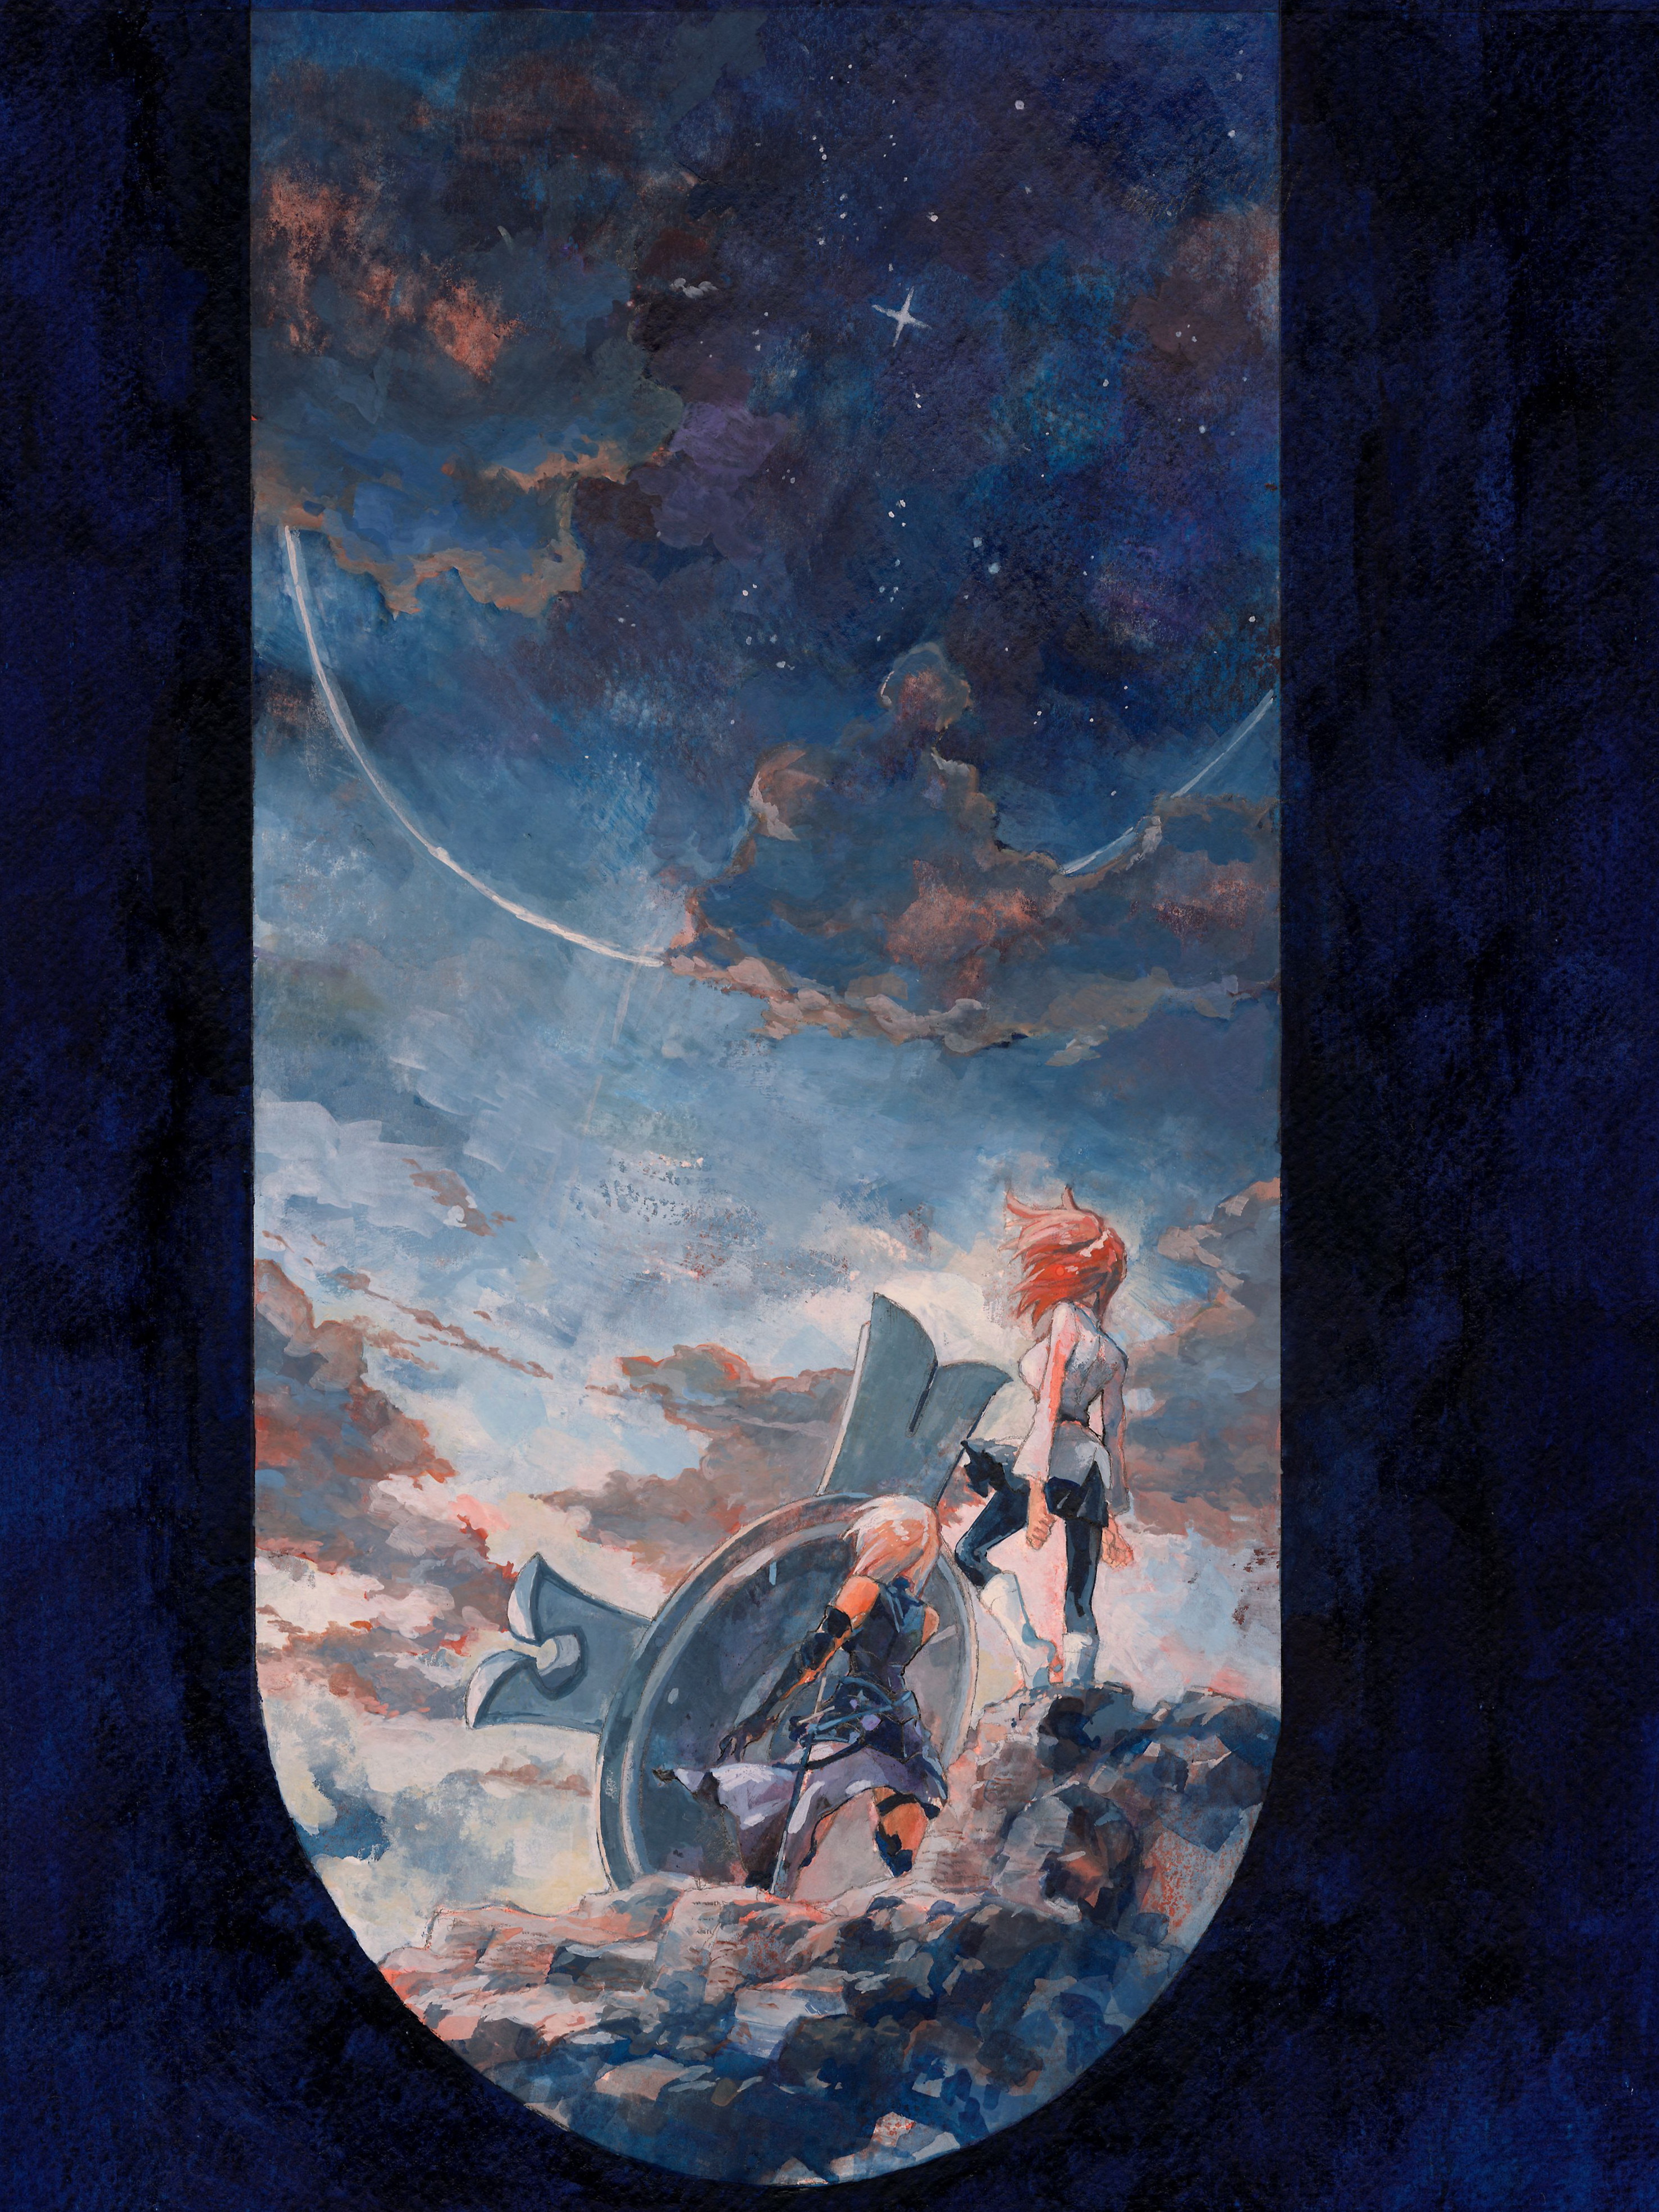 Fate/Grand Order 亚种特异点Ⅲ 尸山血河舞台 下总国 英灵剑豪七番决胜